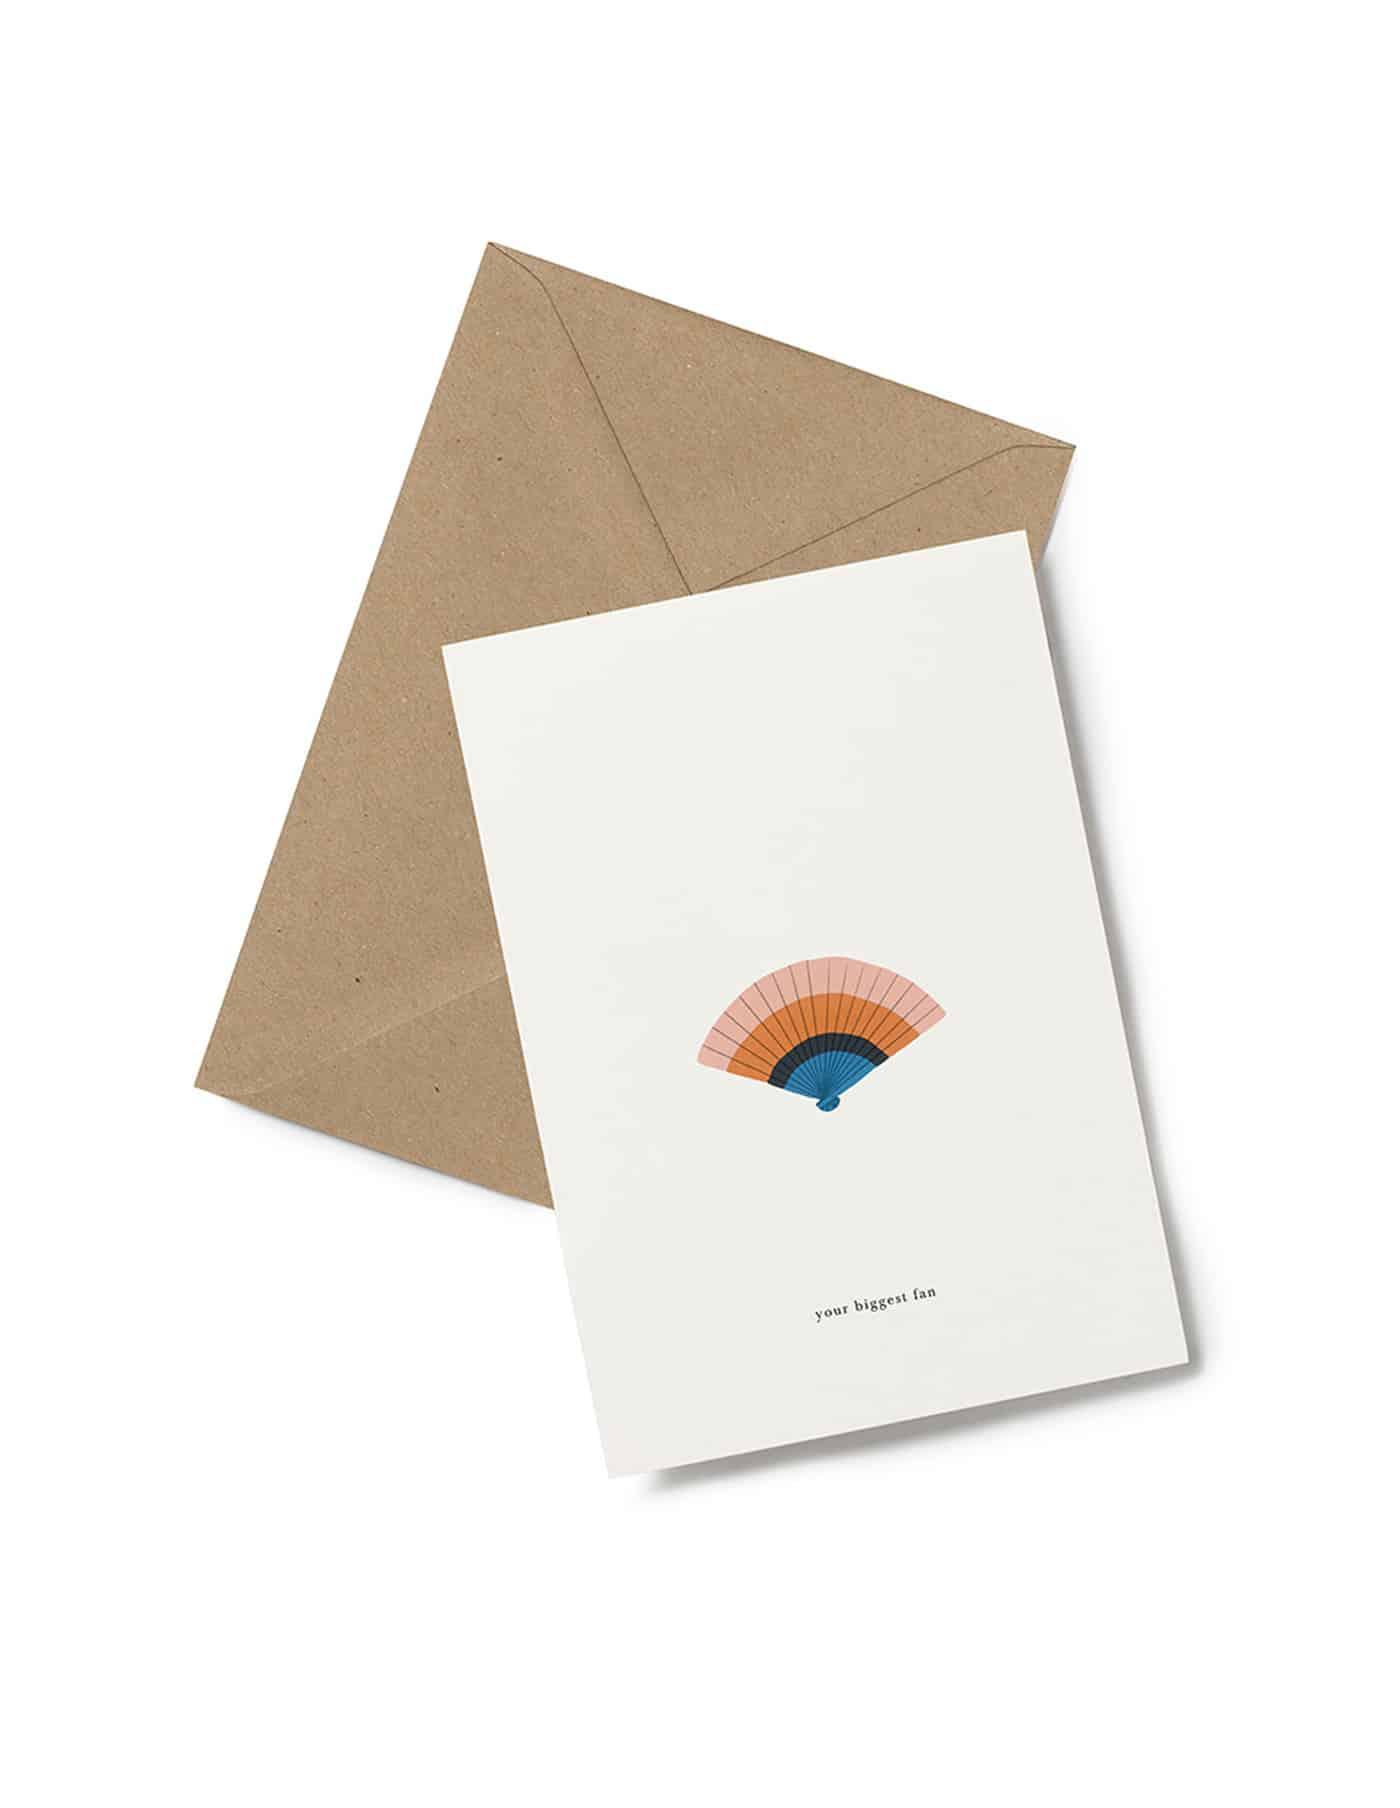 Kartotek 'your biggest fan' Greeting Card